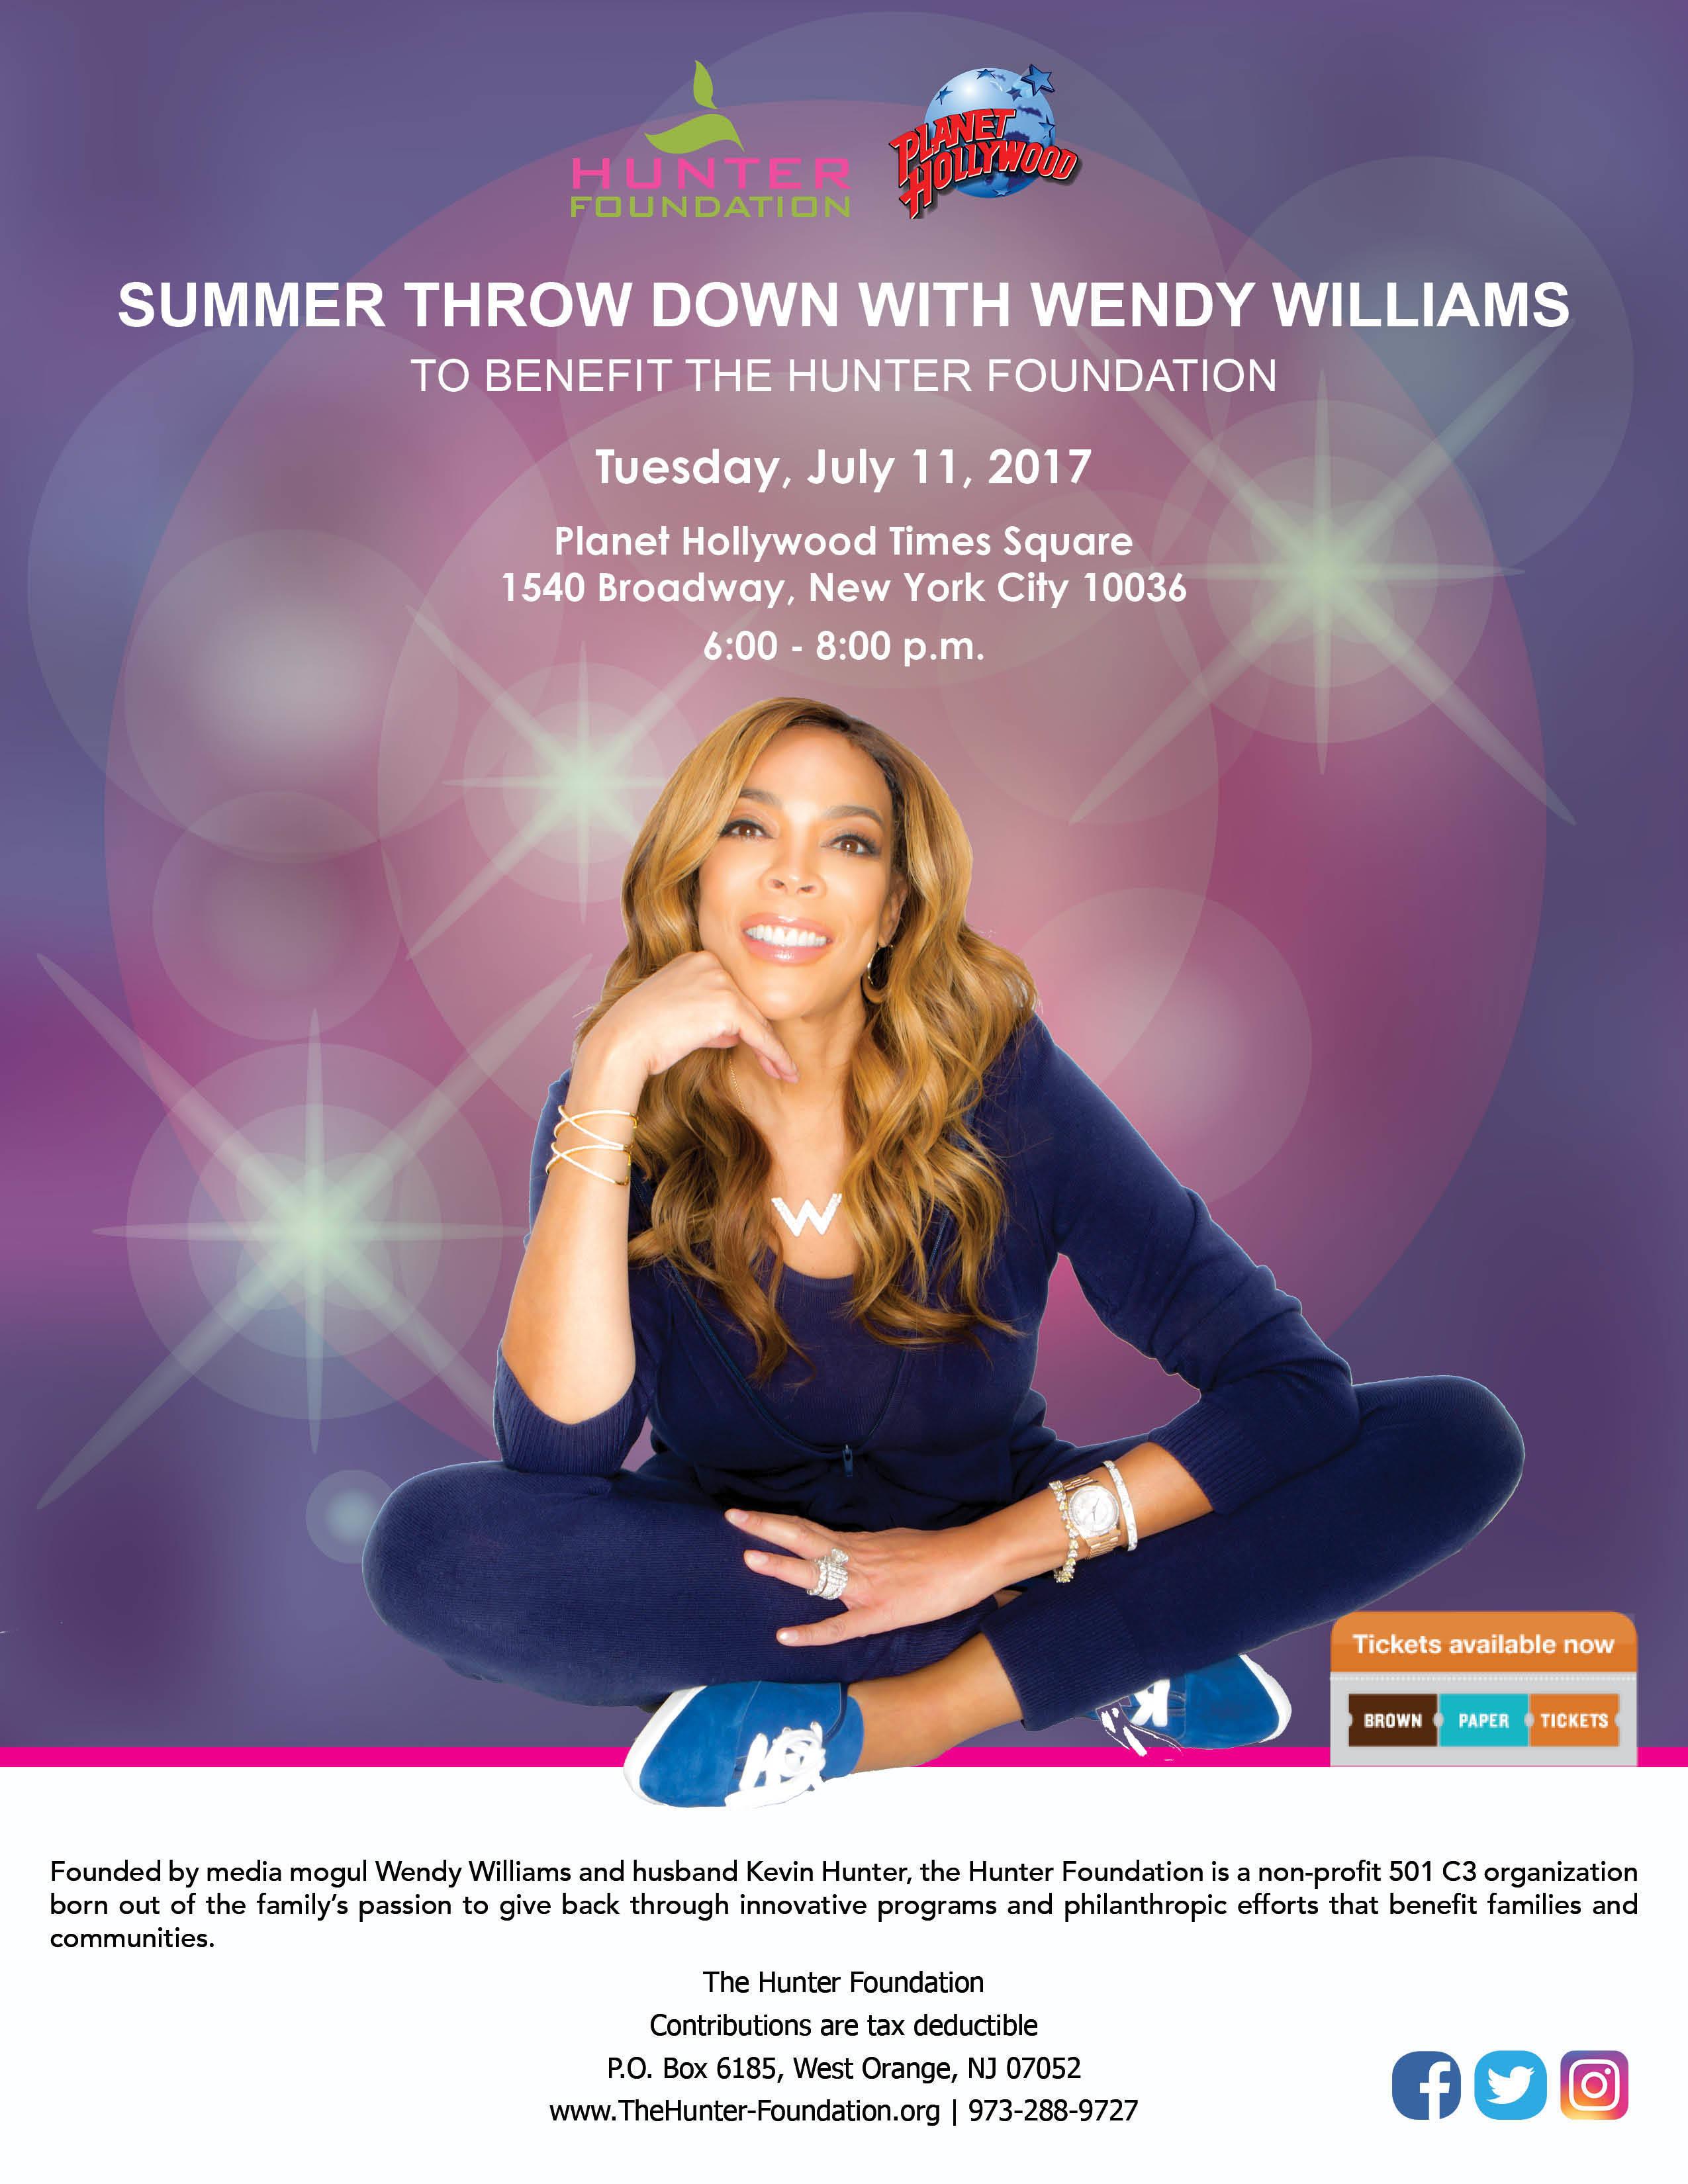 fd482447b2938aebf489_Wendy_Williams_x_Planet_Hollywood_Invite___Sponsorships.jpg